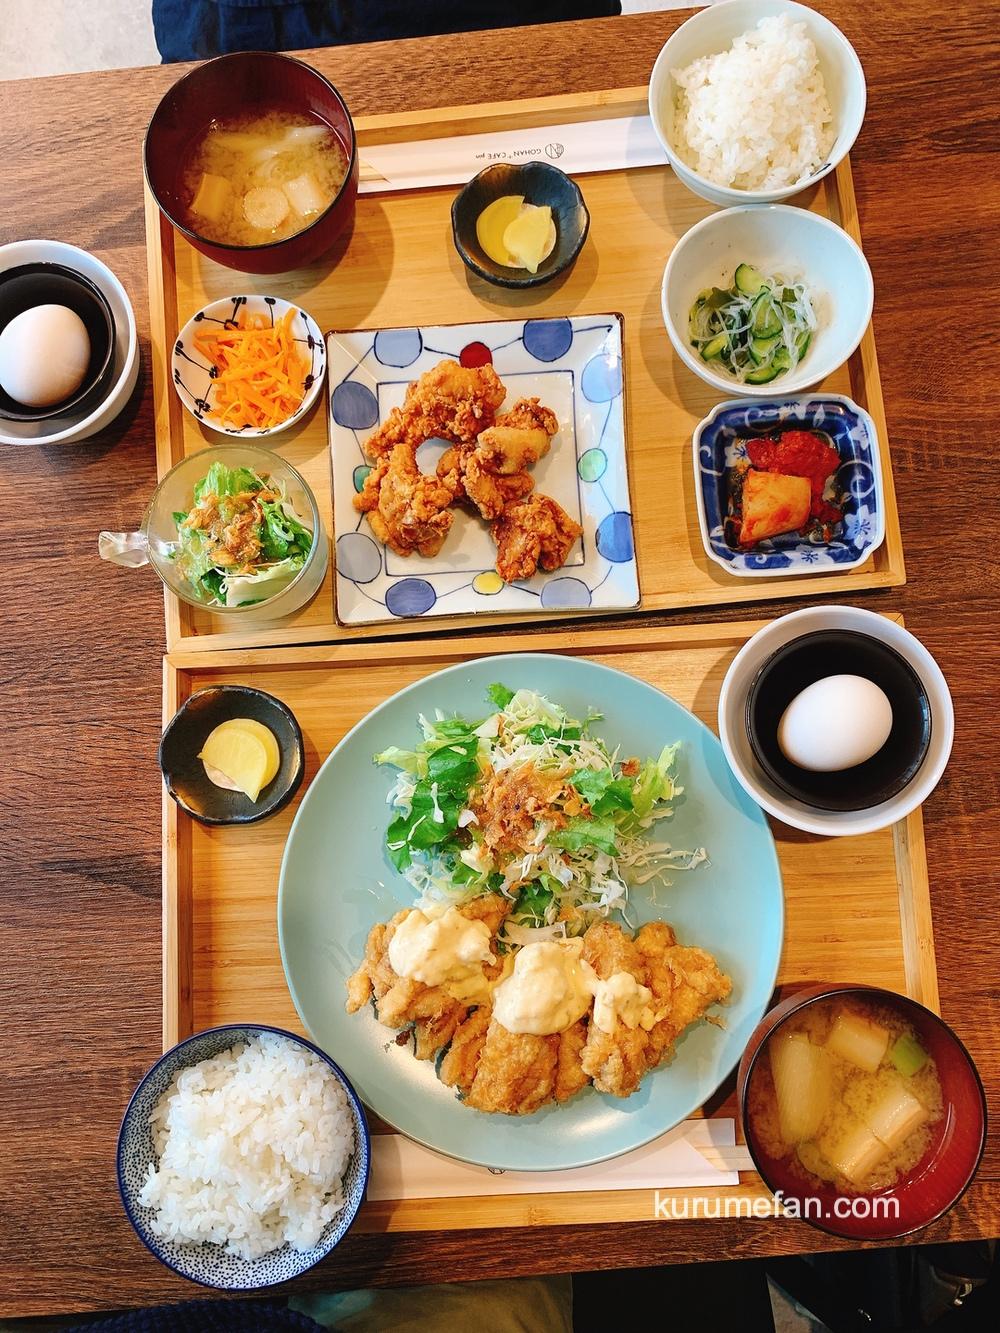 GOHAN+CAFE pin チキン南蛮(マウンテン定食)、唐揚げ(pin定食)